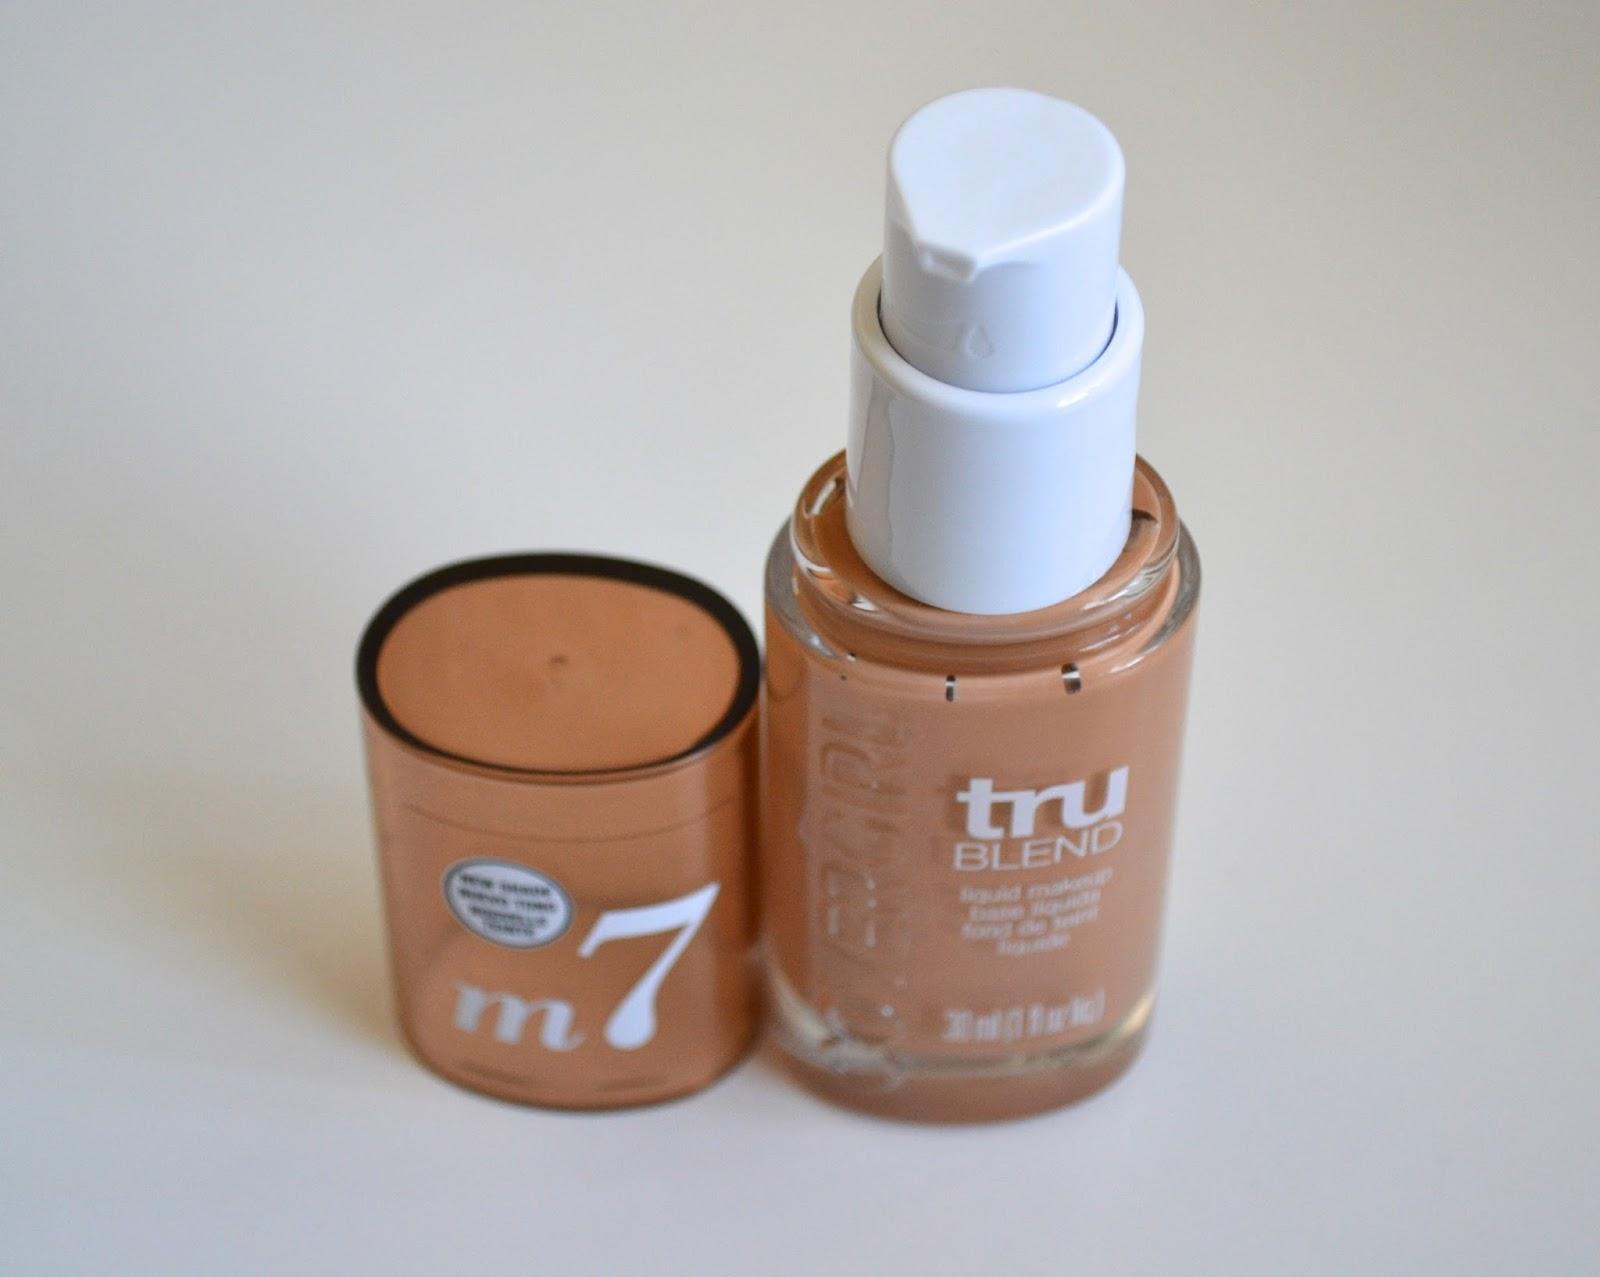 Aquaheart Covergirl Trublend Liquid Makeup In Soft Honey